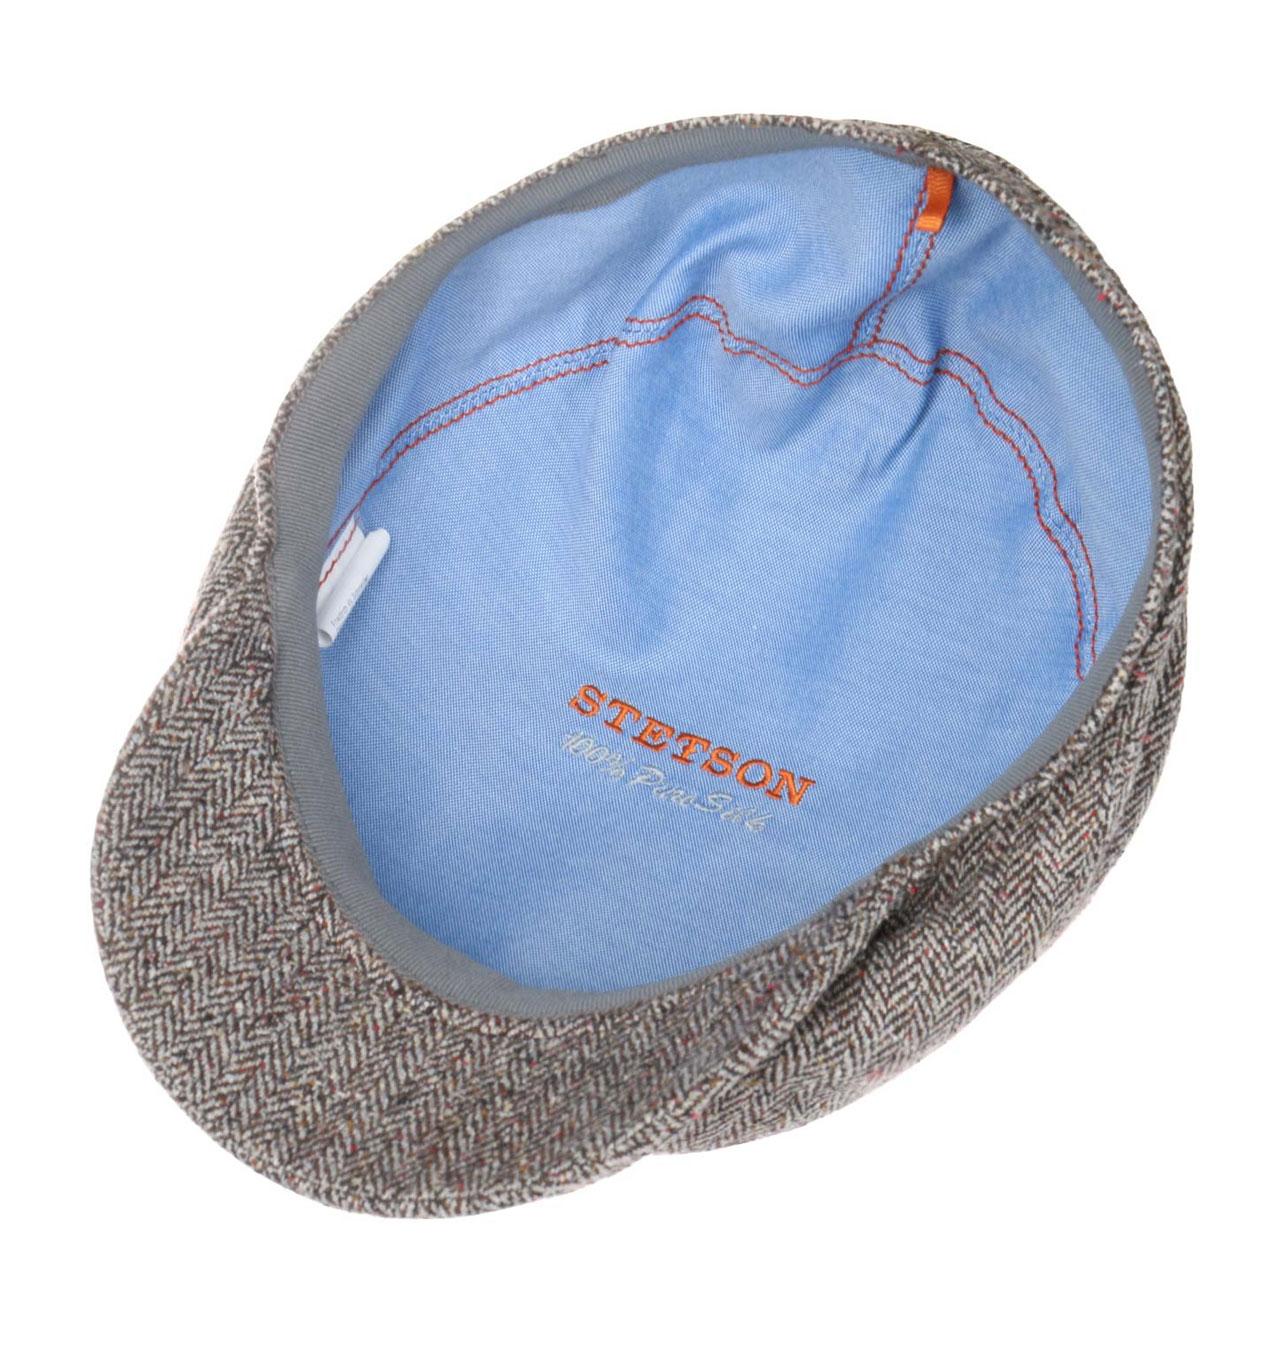 03c53f21140cf Stetson - Belfast Silk Flat Cap - Anthracite